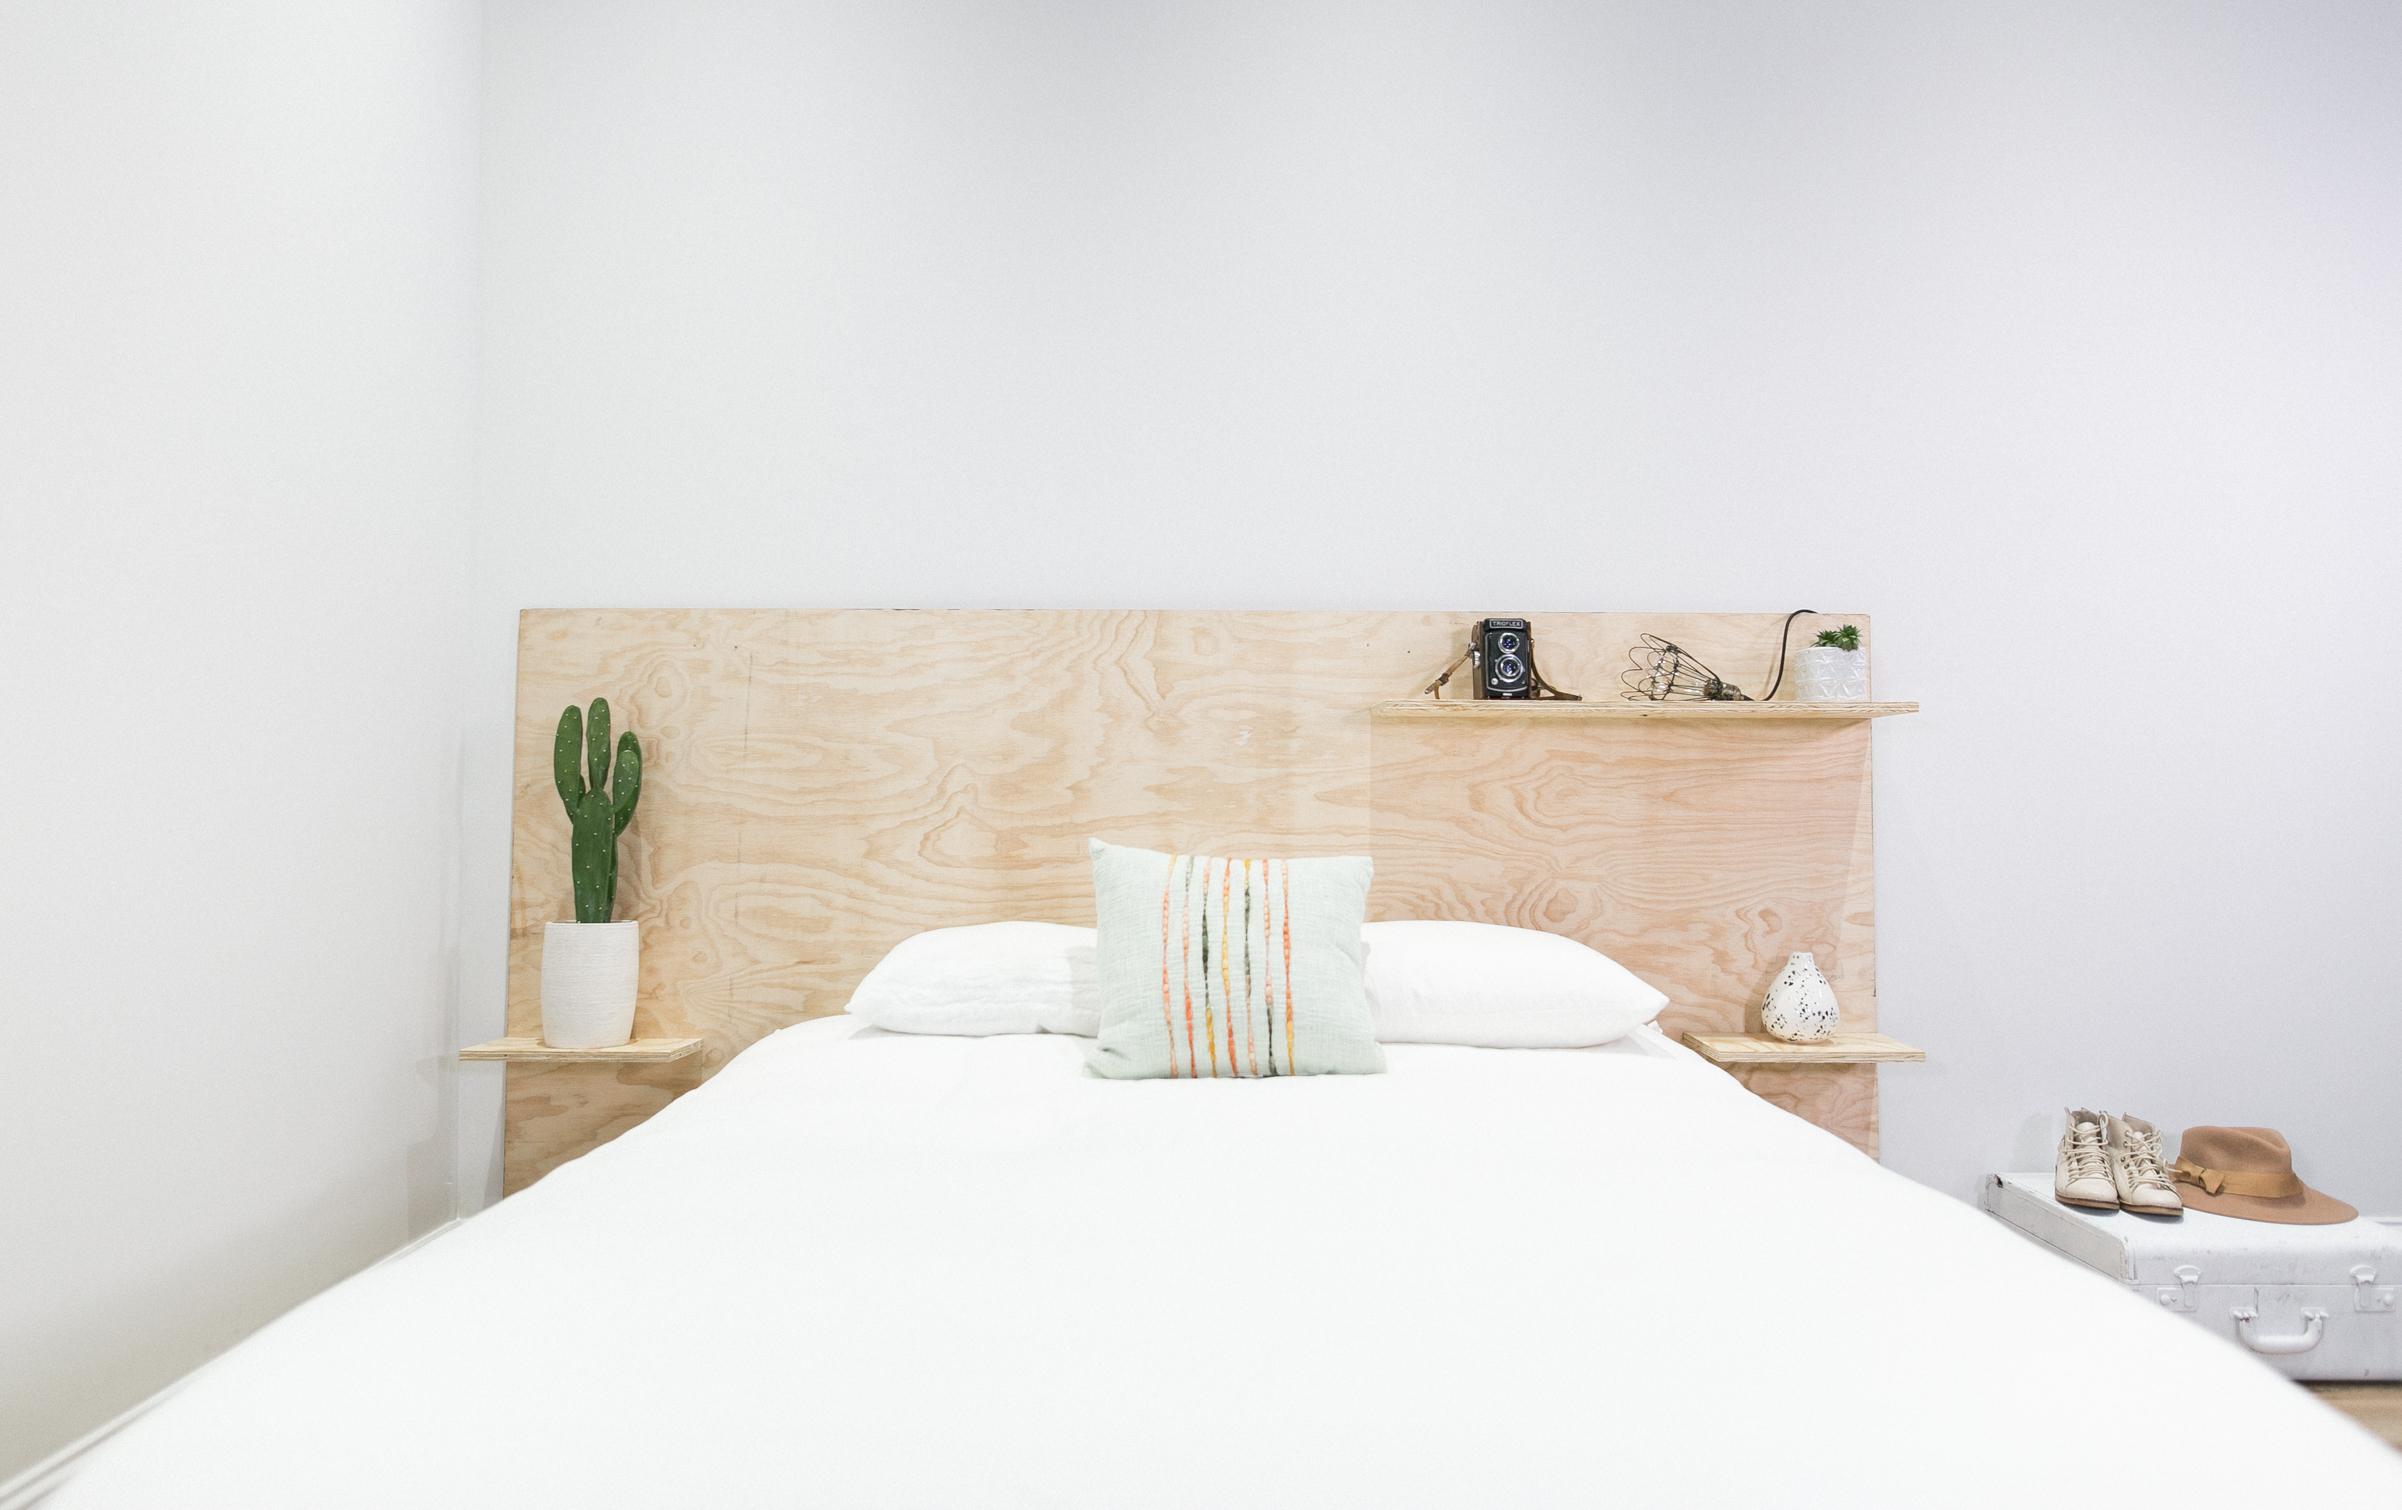 Mr Kate DIY Minimalist Plywood Shelf Headboard